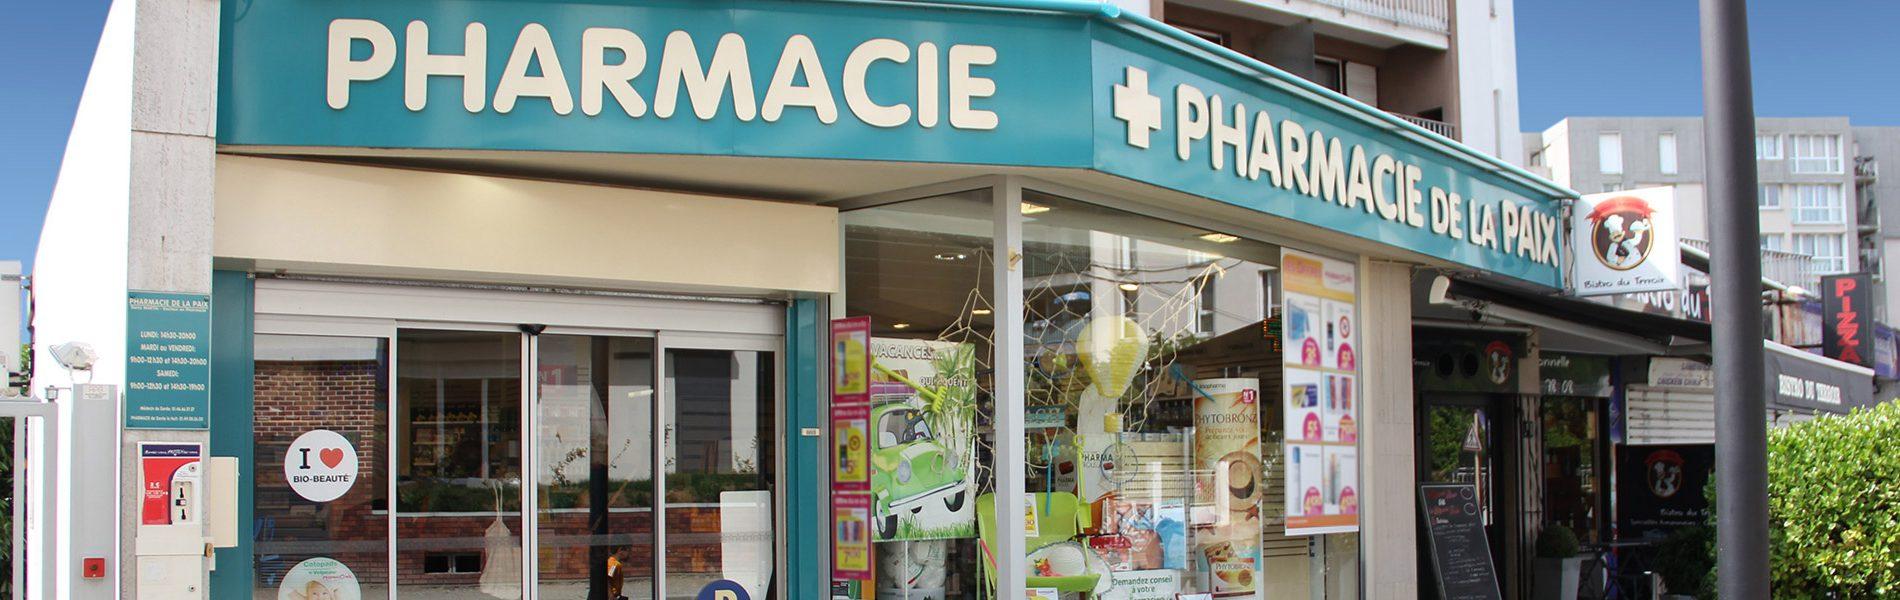 Pharmacie DE LA PAIX - Image Homepage 1